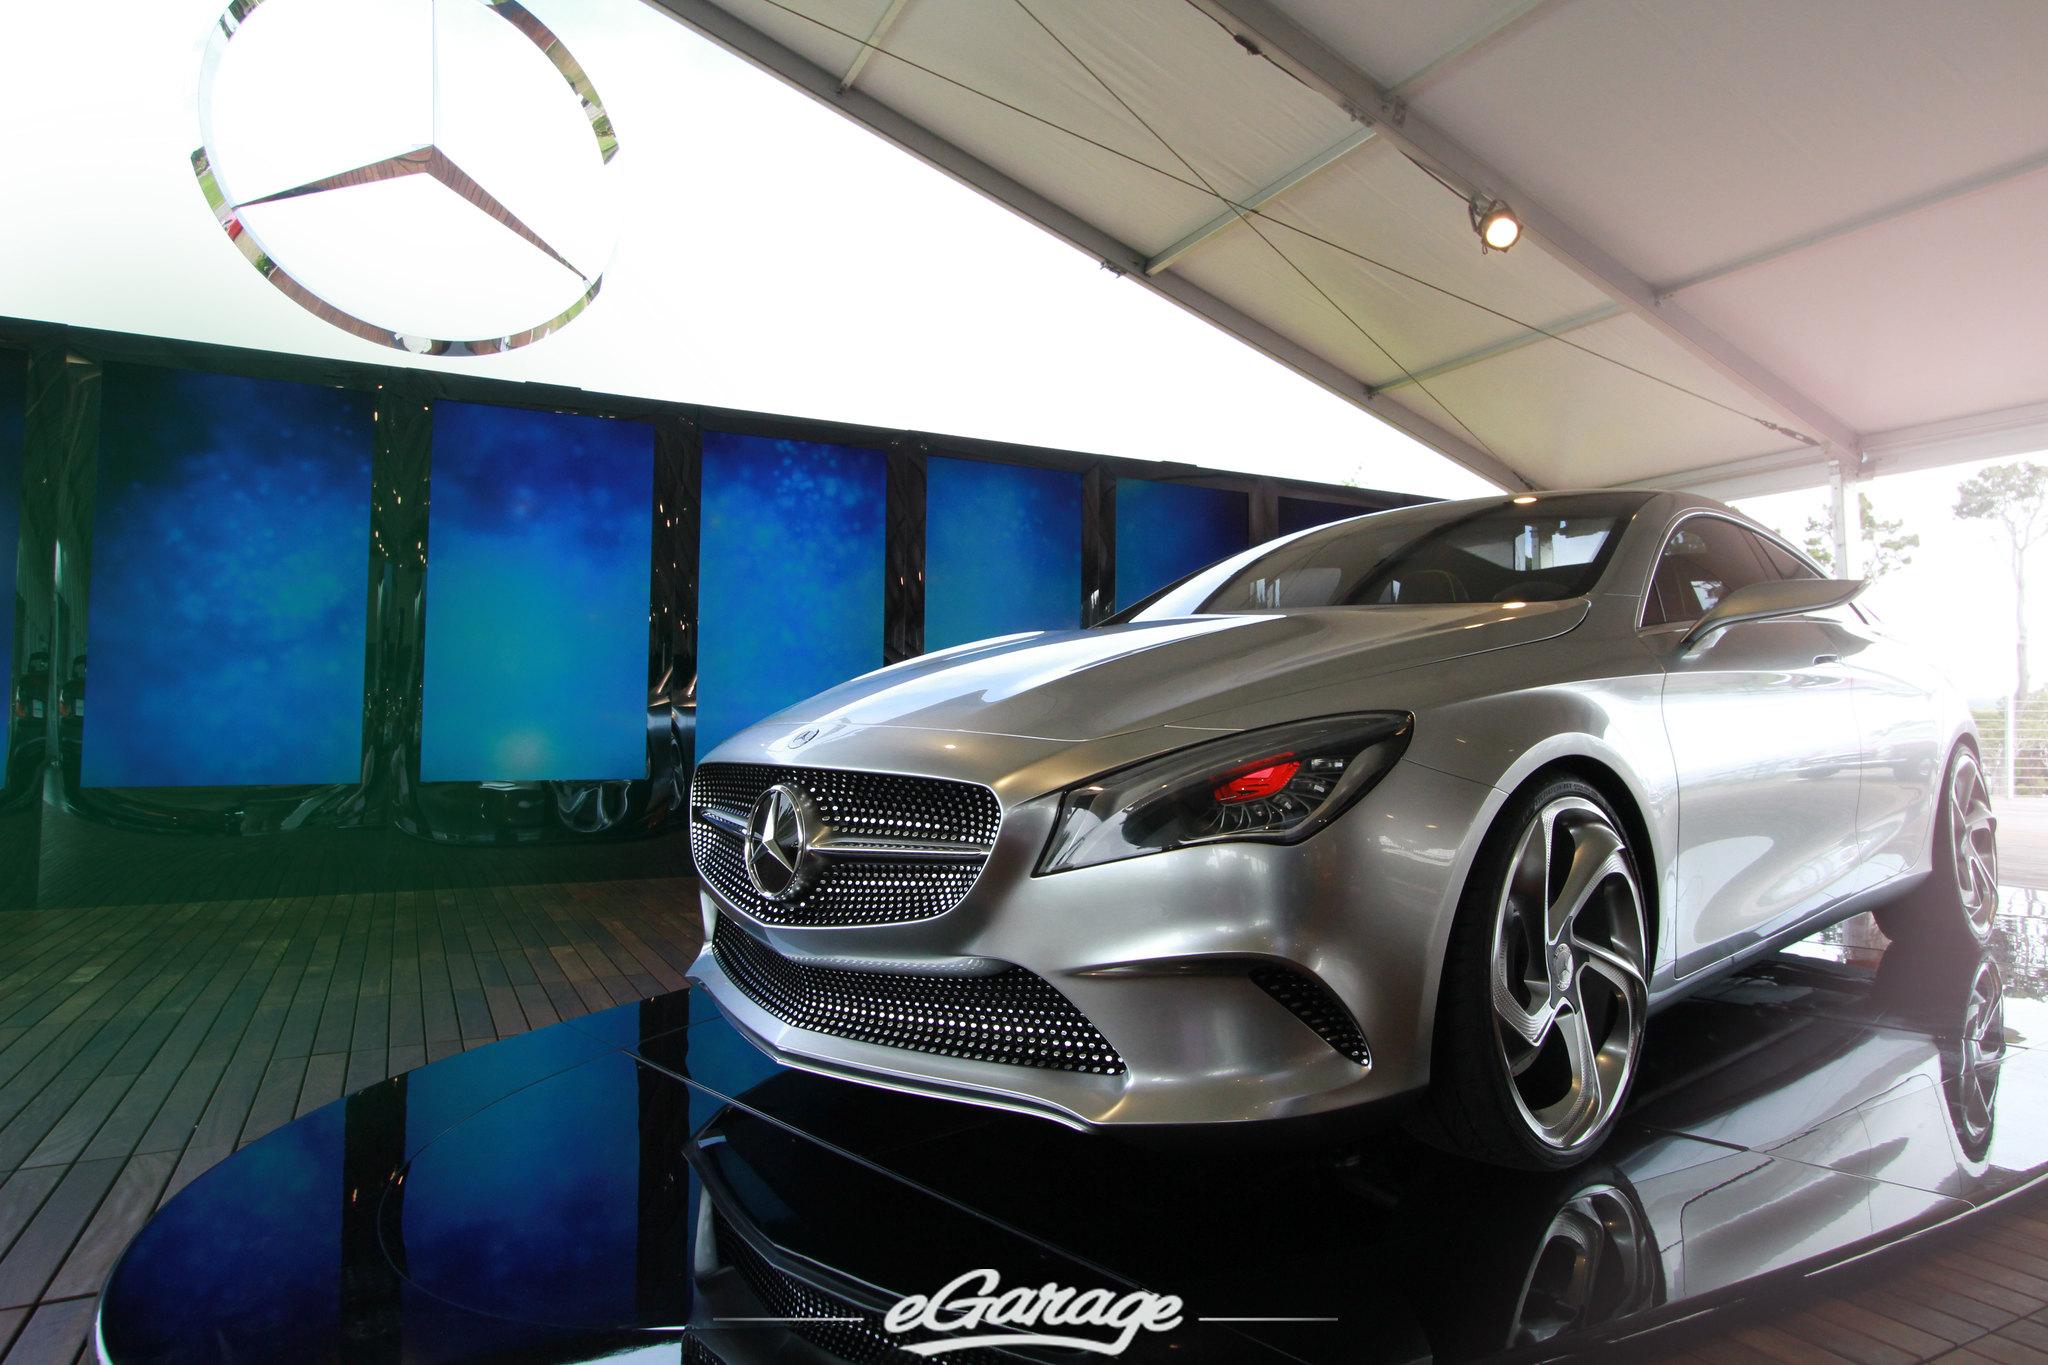 7828964540 c1083ecdcb k Mercedes Benz Classic